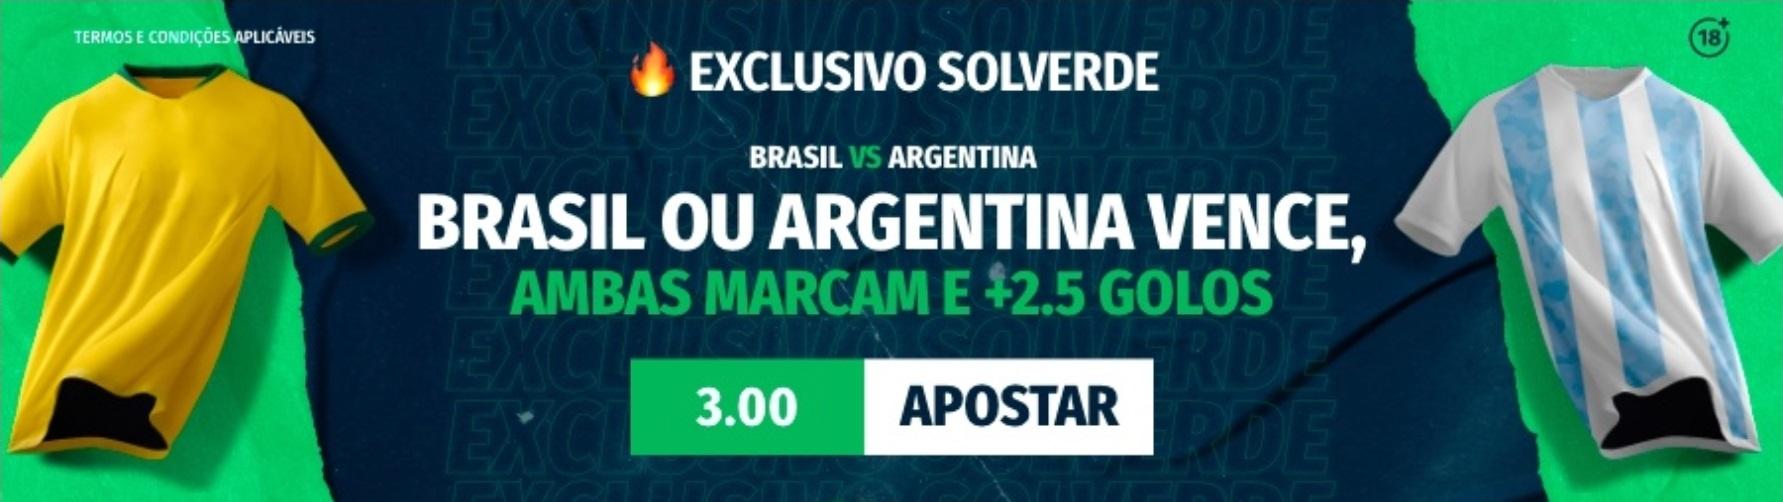 Suíça Itália Brasil Argentina